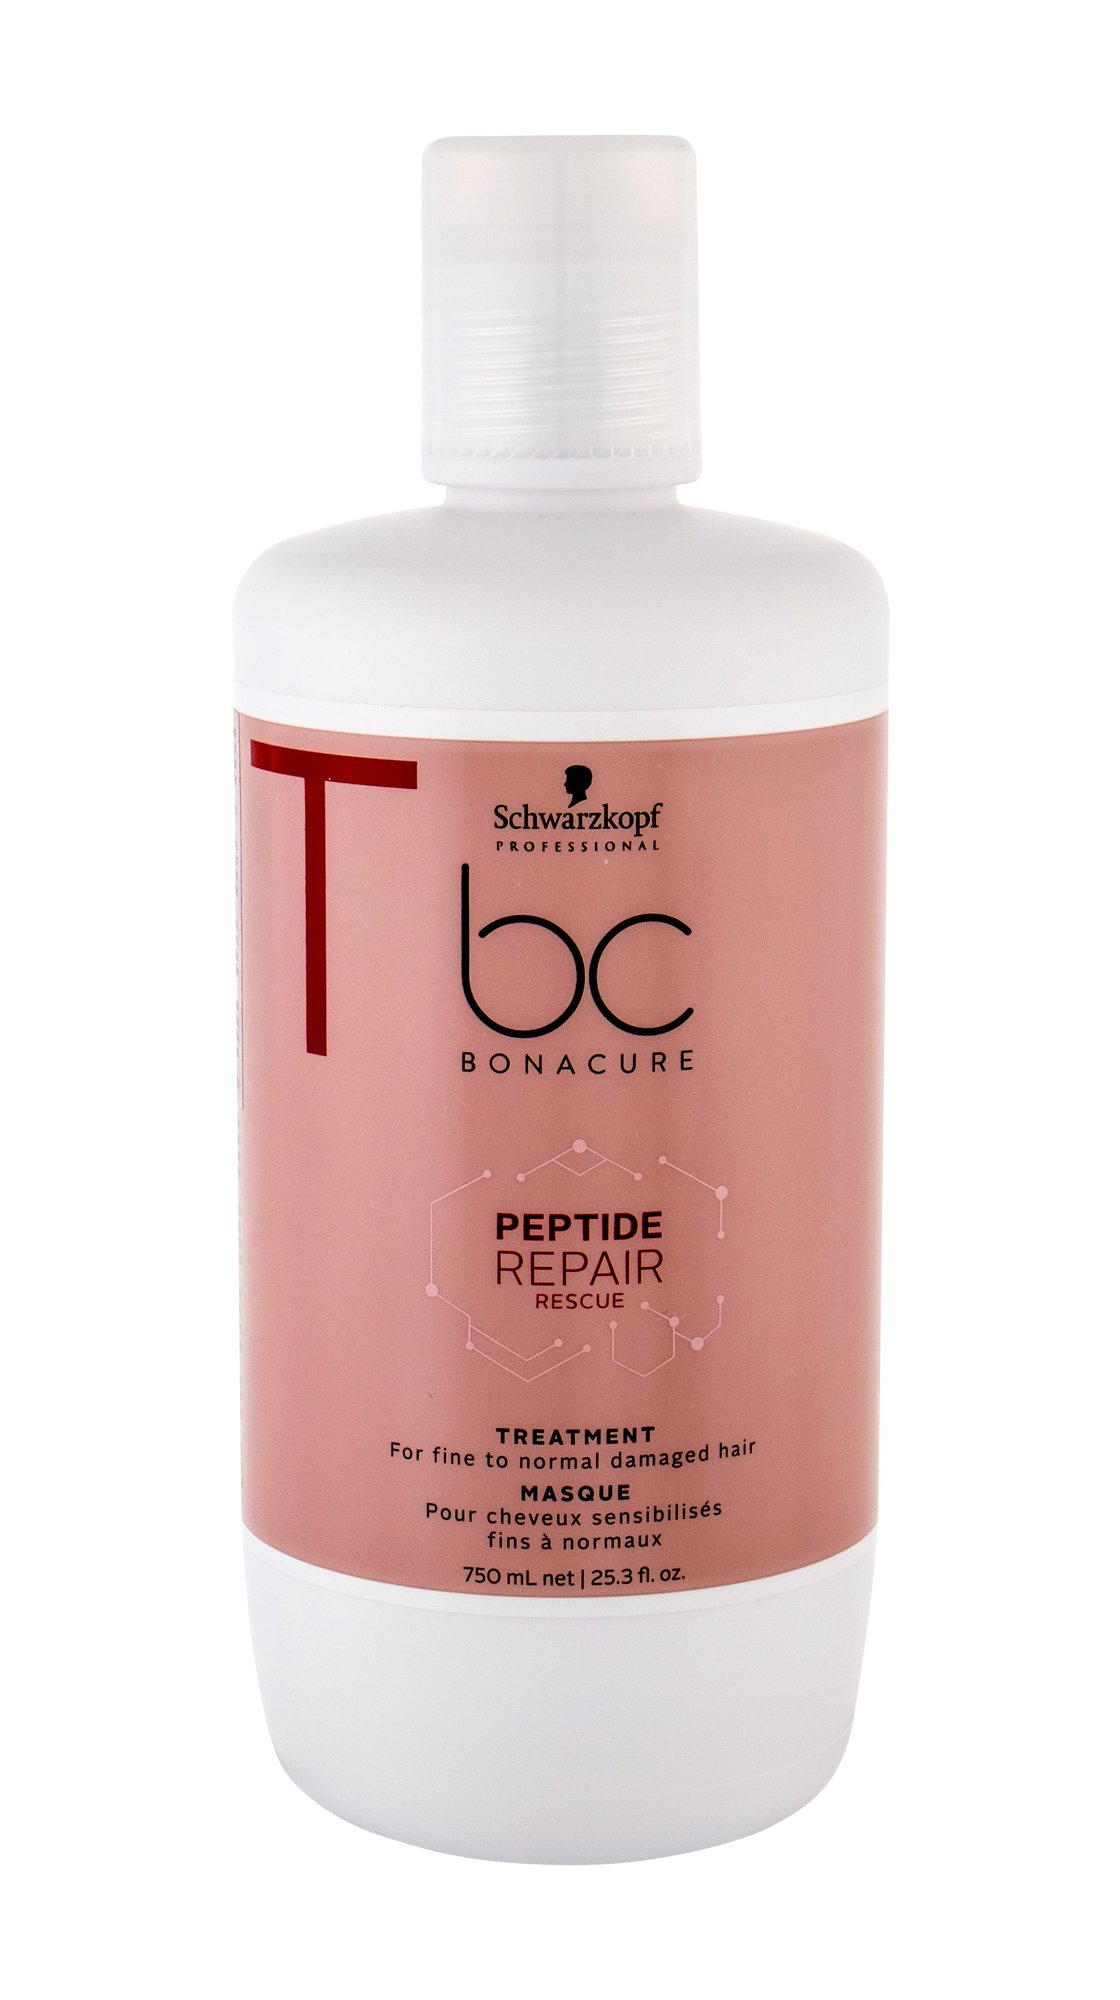 Schwarzkopf BC Bonacure Peptide Repair Rescue Hair Mask 750ml